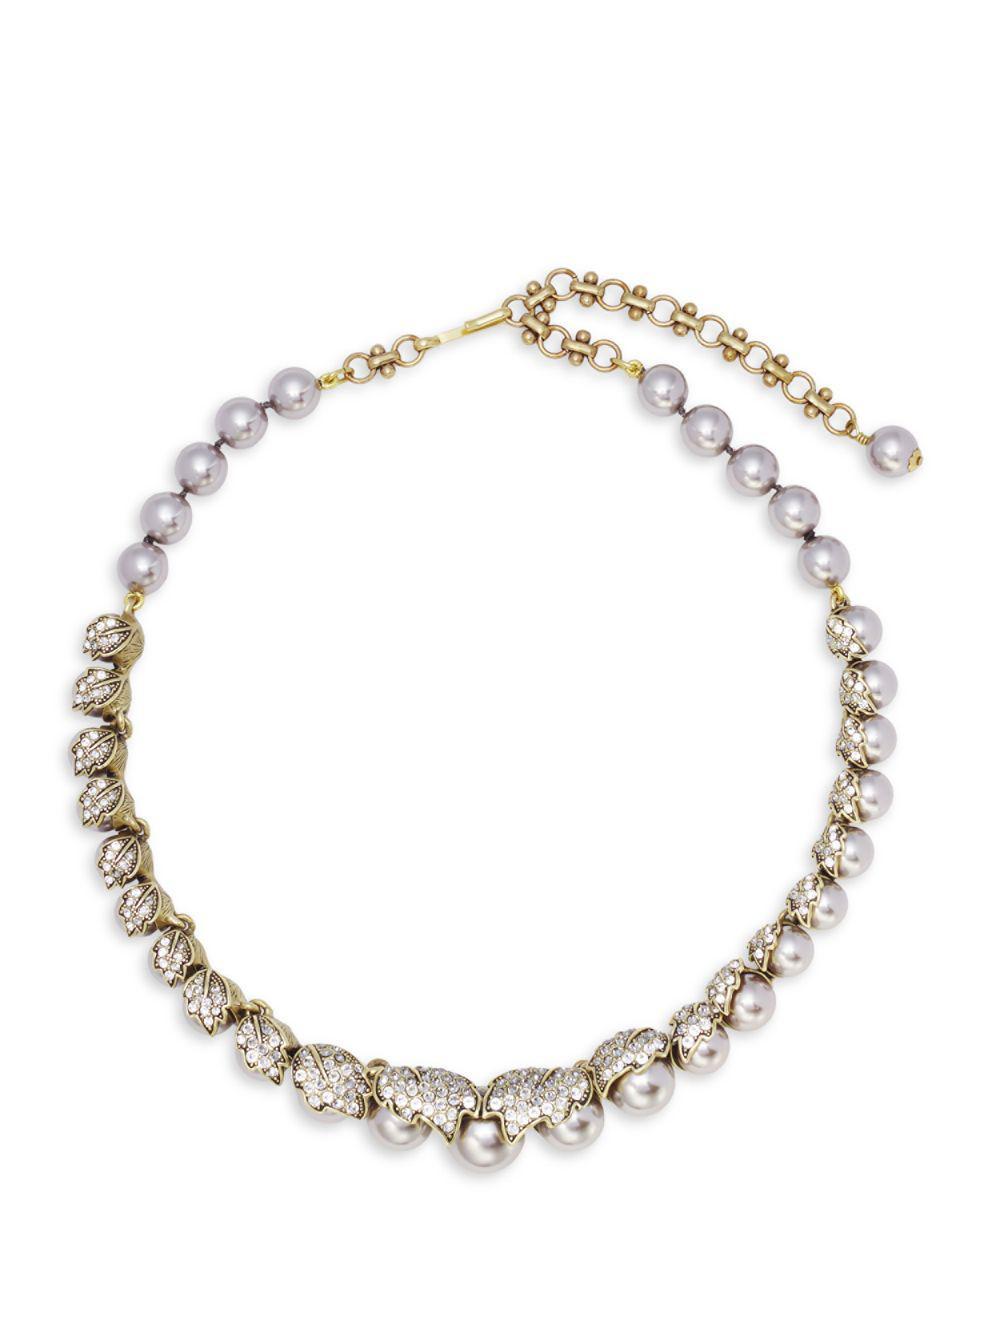 8fec6a65e9811 Lyst - Heidi Daus Faux Pearl And Swarovski Crystal Necklace in Metallic